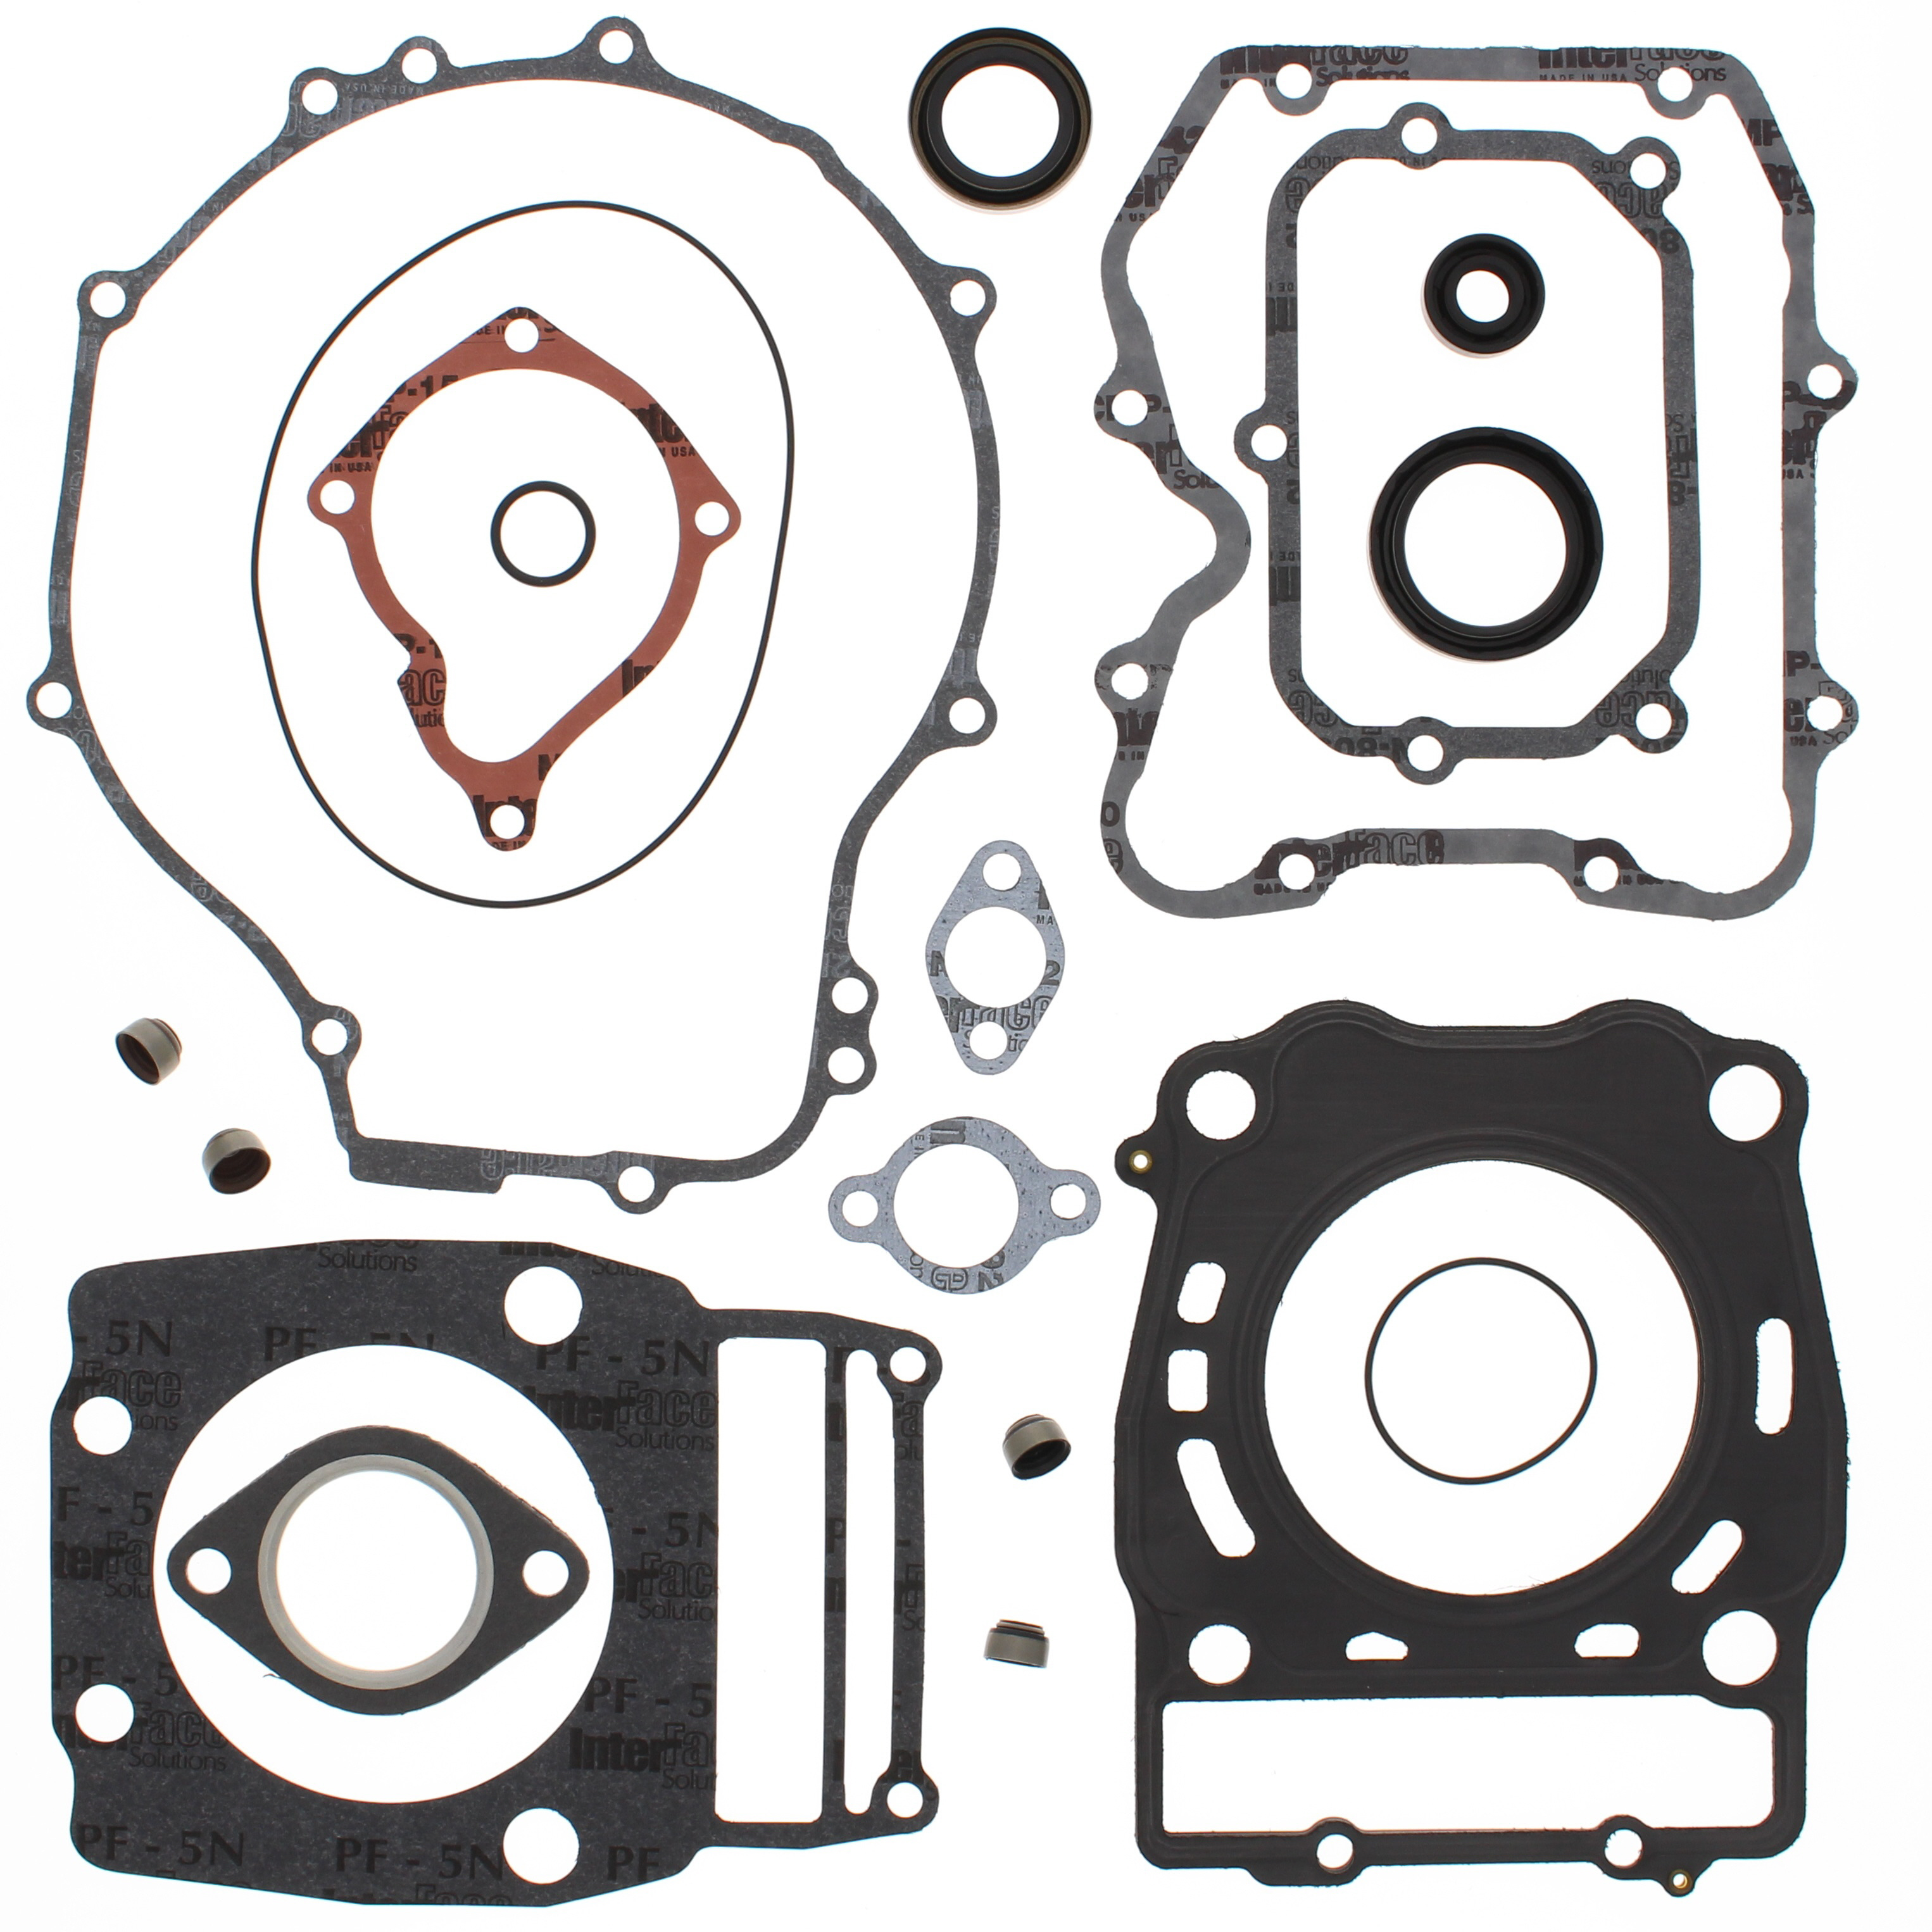 Winderosa Complete Gasket Kit For Polaris Sportsman 400 4x4 2002-2005 400cc